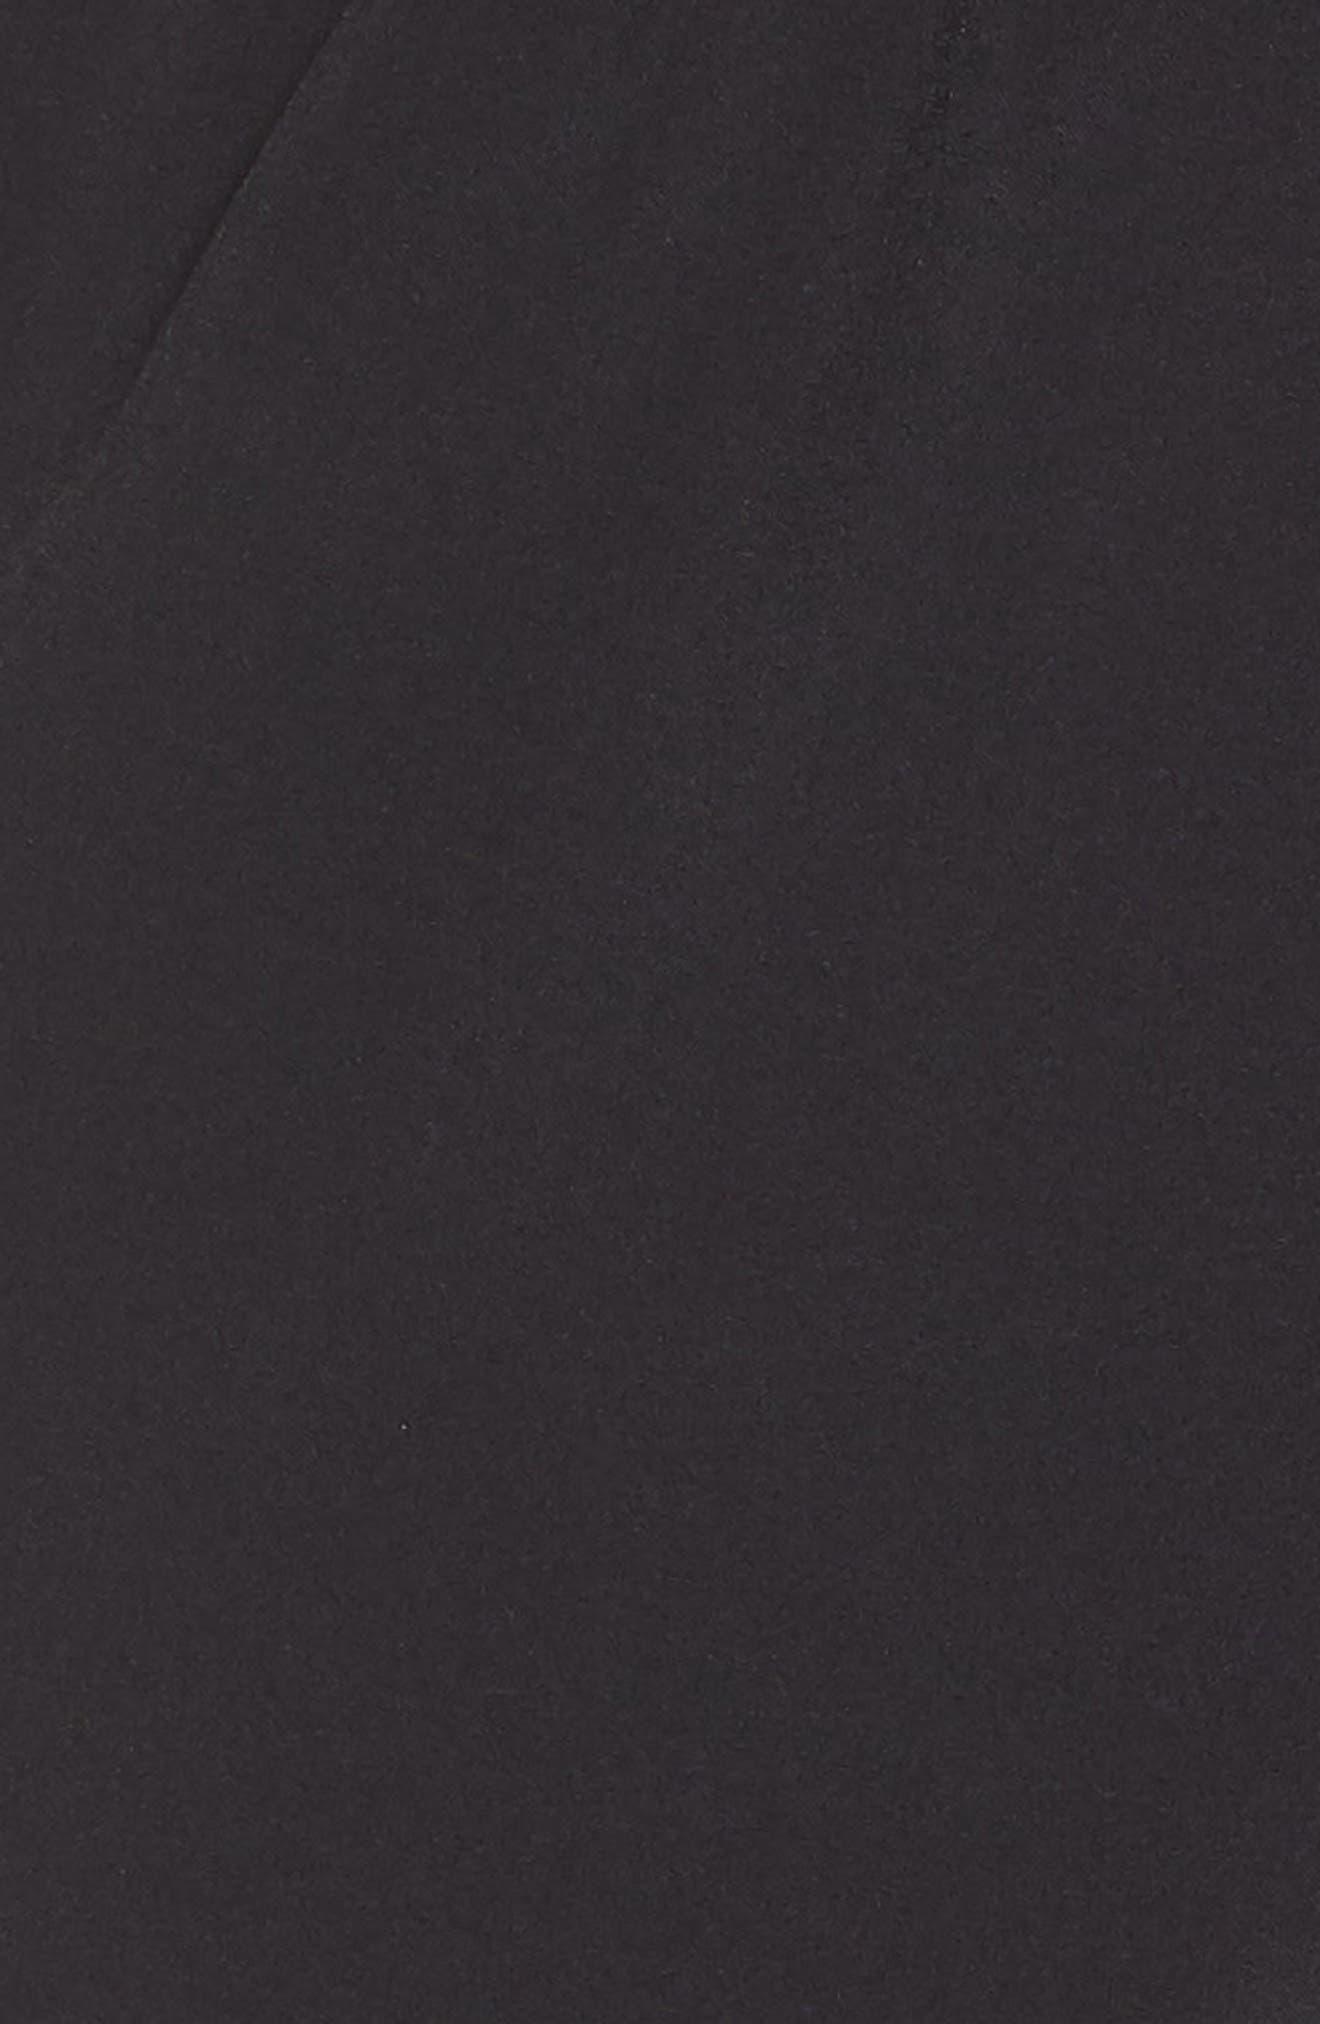 Hoop Shorts,                             Alternate thumbnail 6, color,                             BLACK